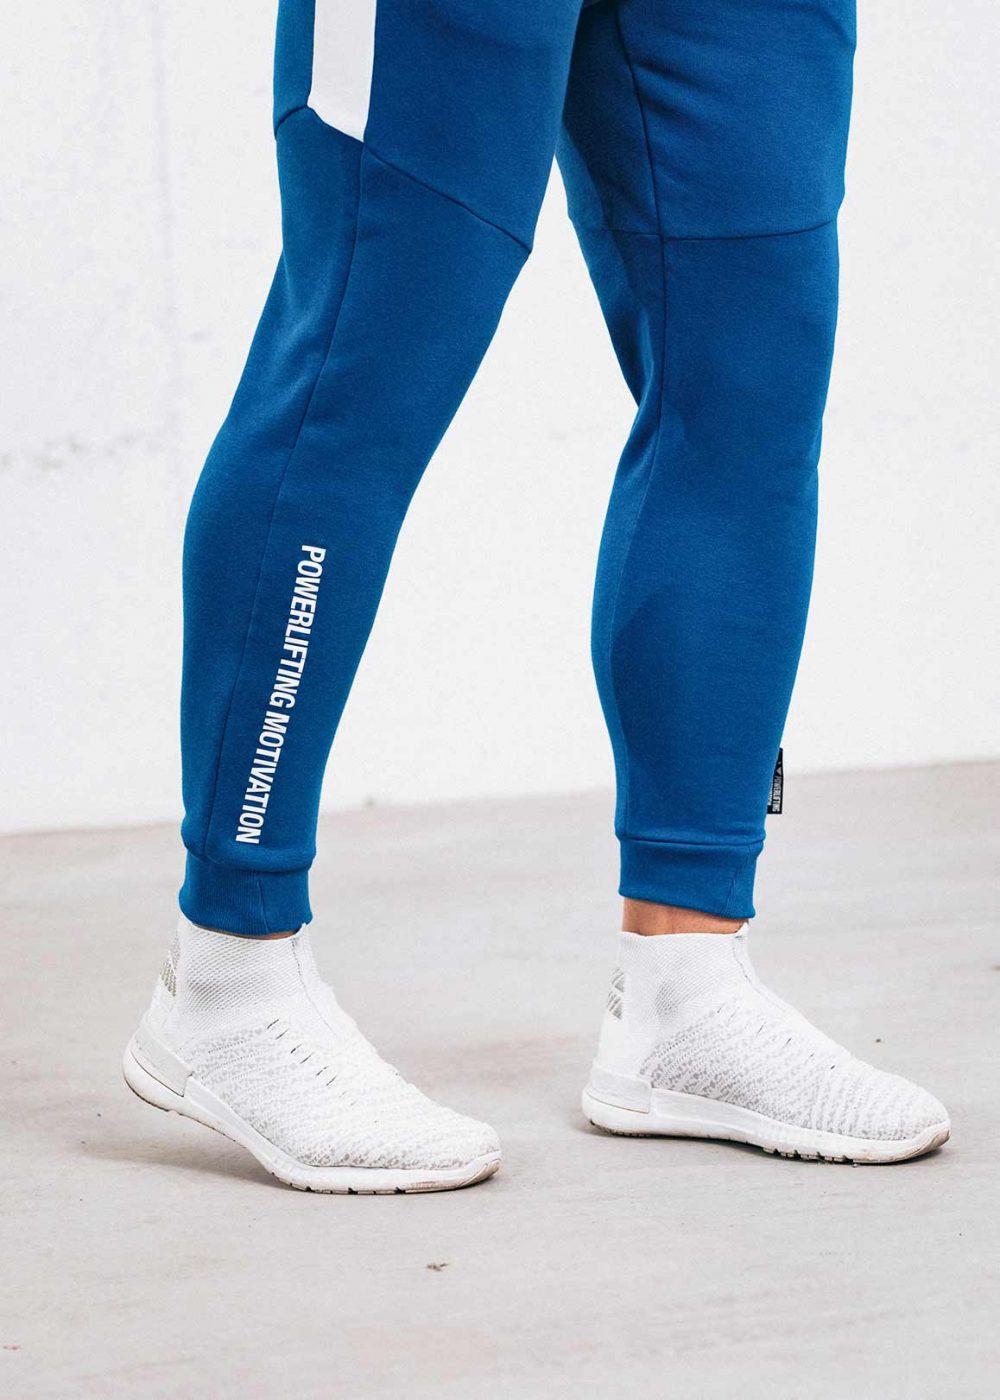 PM-ADAPT-sweatpants-side-details-web